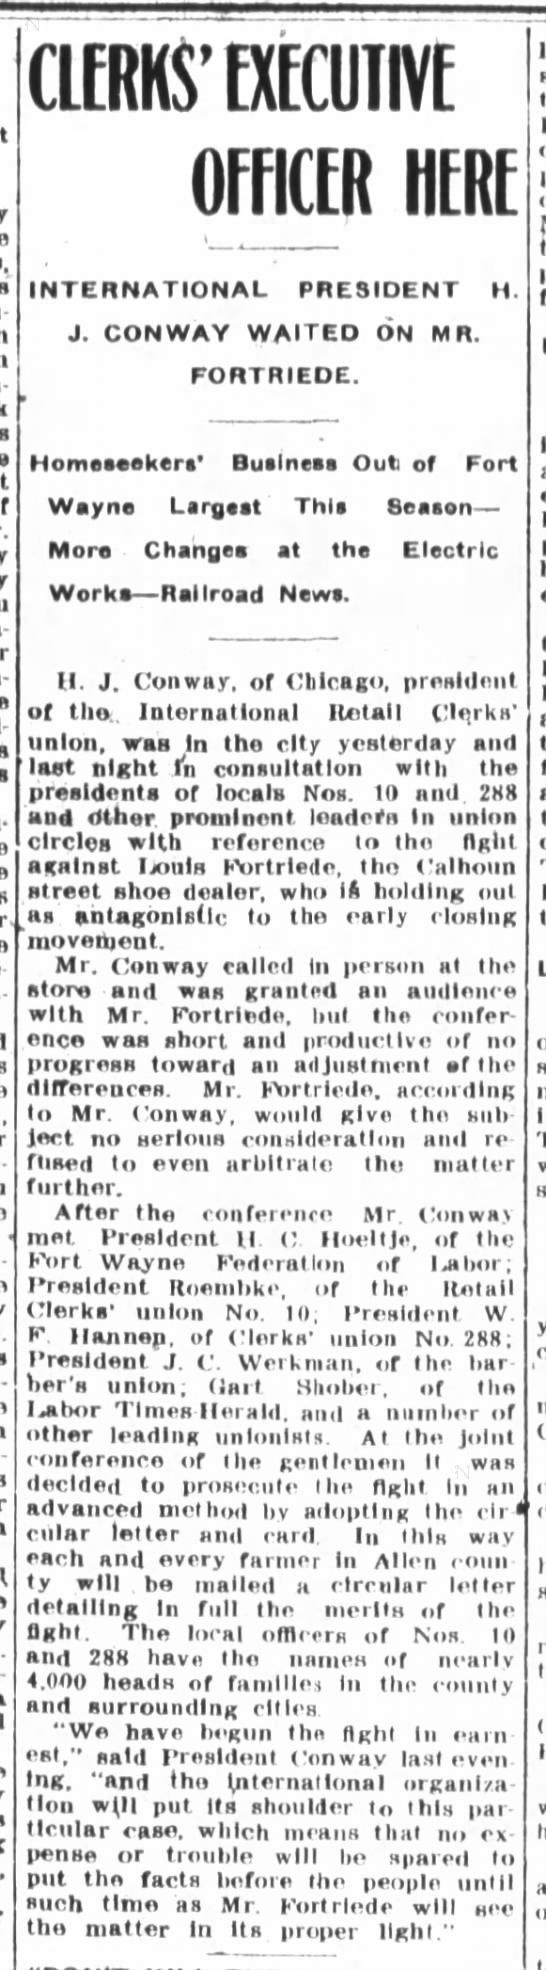 Louis Fortriede, the Ft.Wayne Journal-Gazette, Wed. Mar 6, 1907 p.3 -